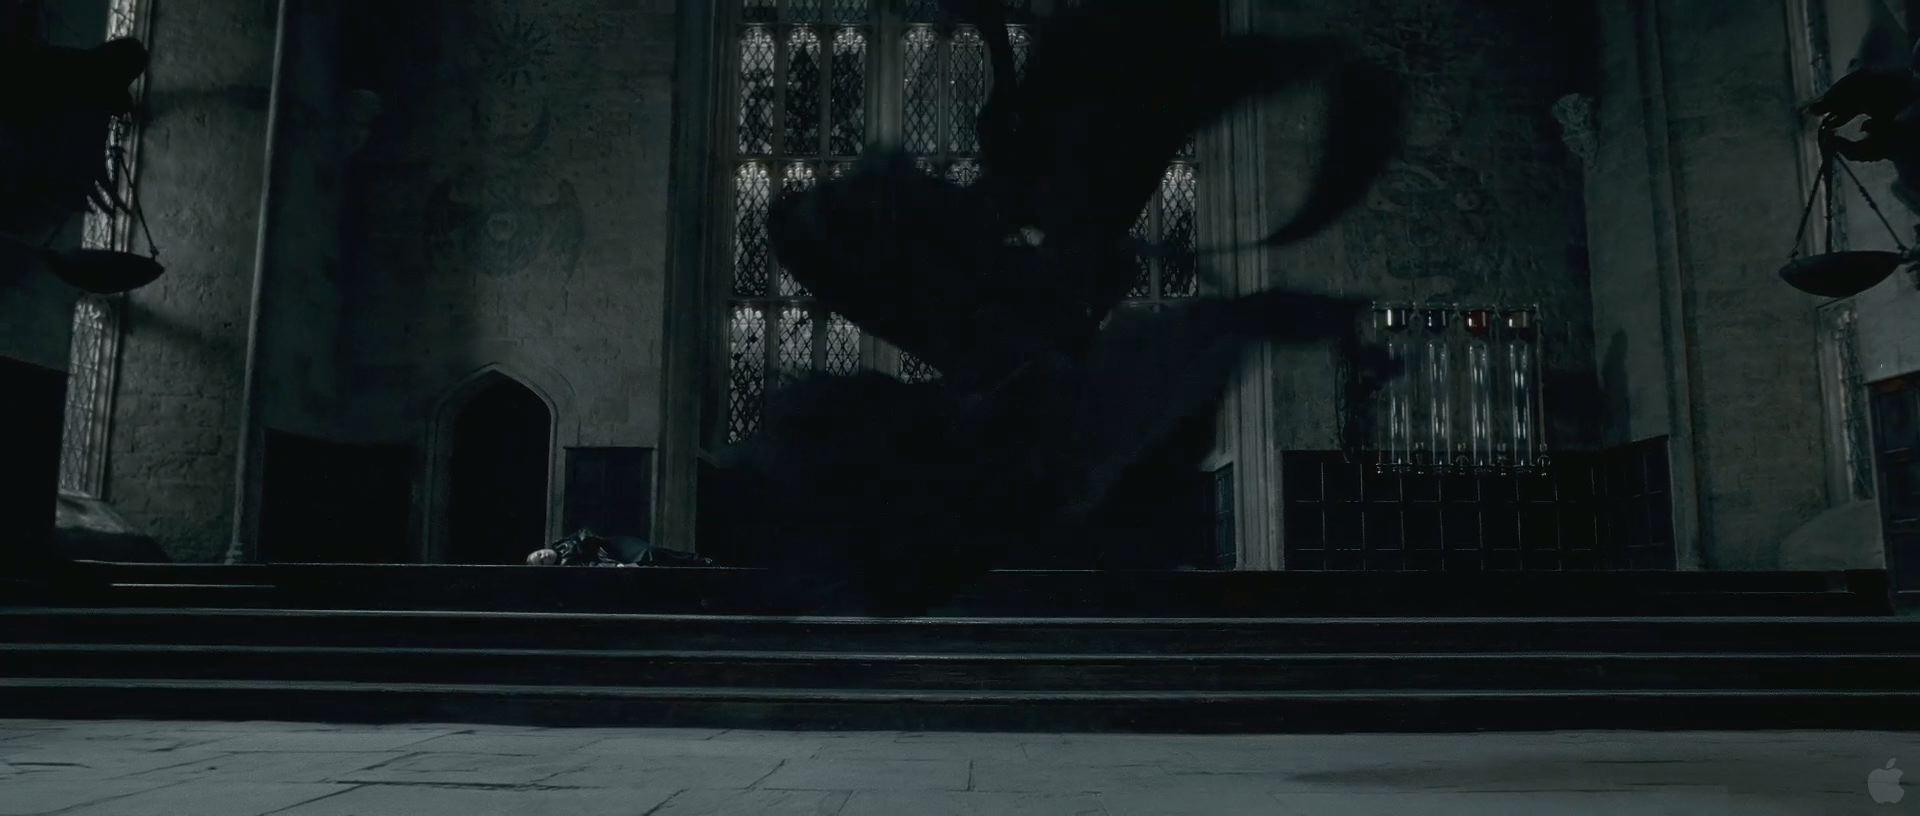 Harry Potter BlogHogwarts HP7 2 Trailer 65